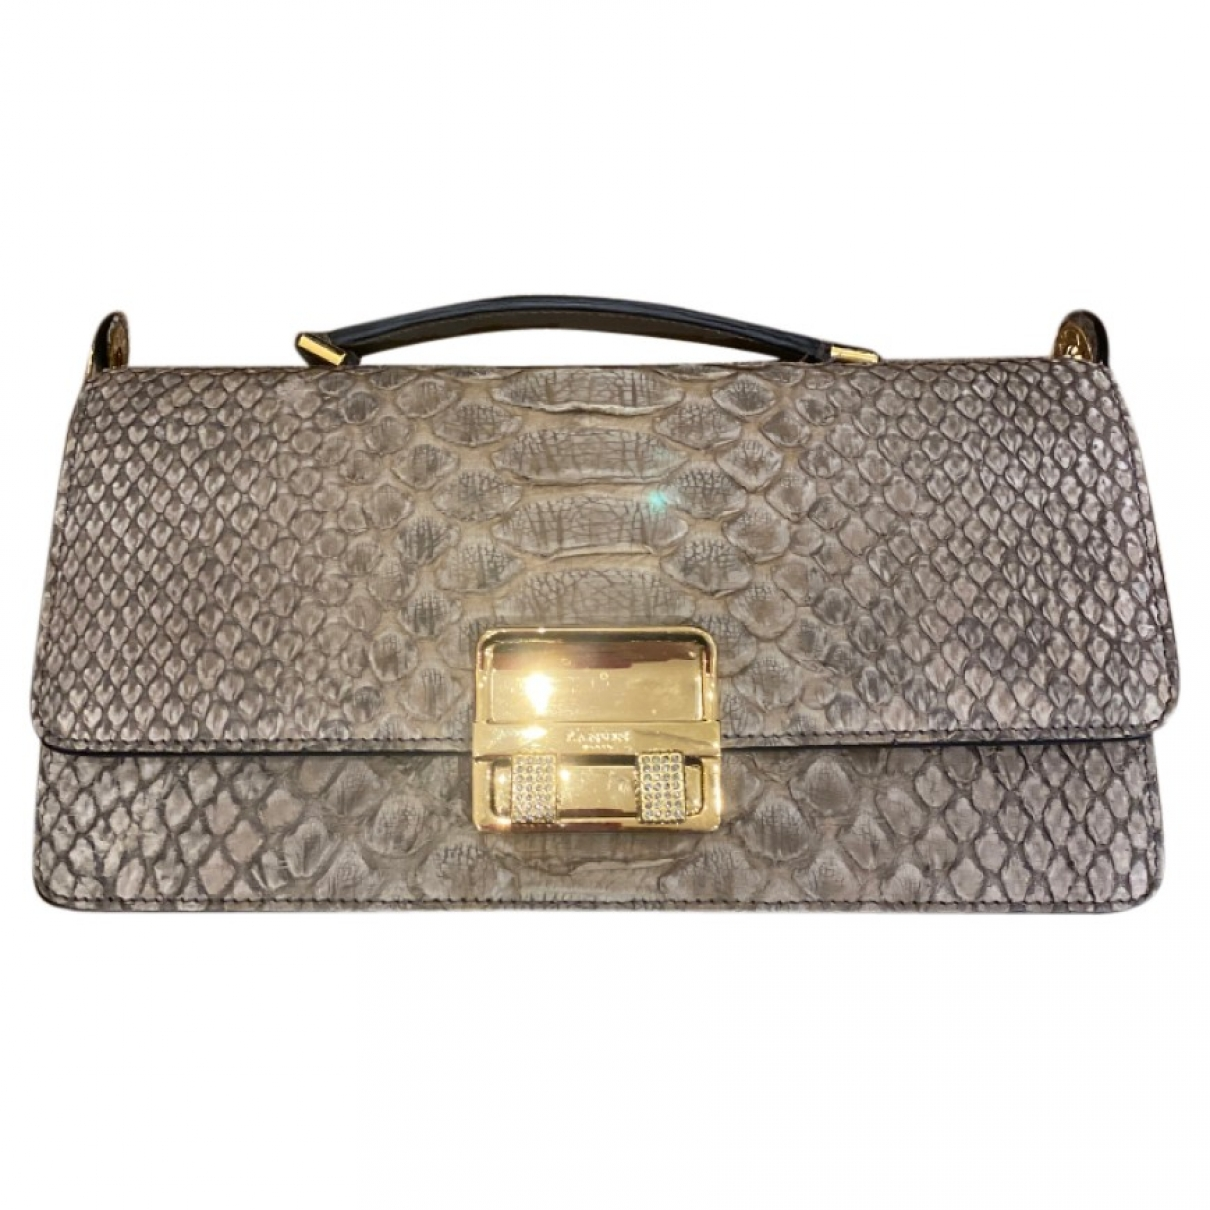 Lanvin \N Beige Python handbag for Women \N